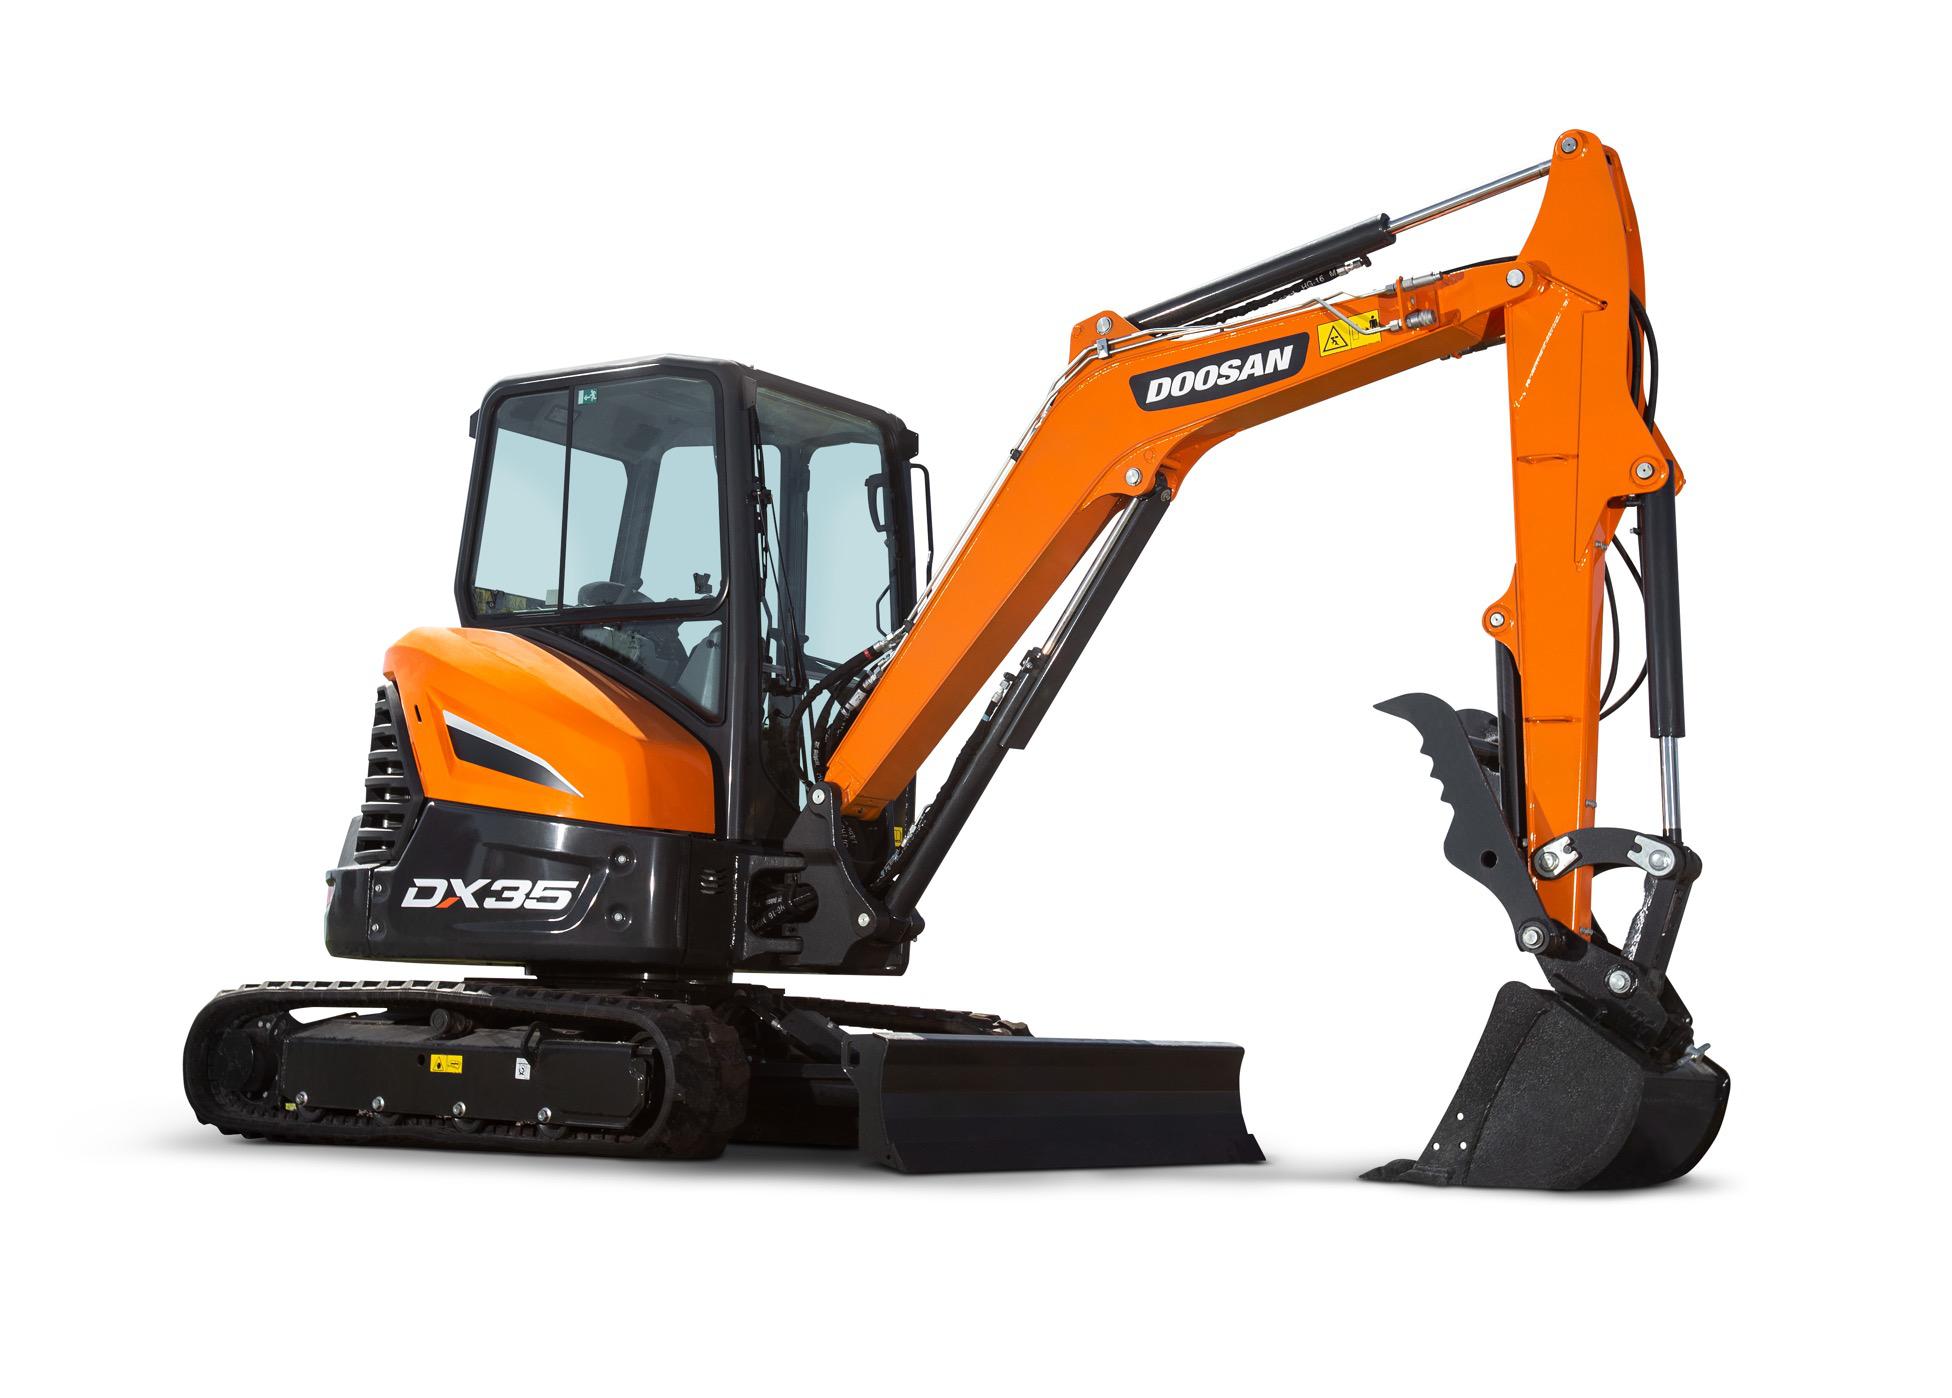 New mini excavators from Doosan